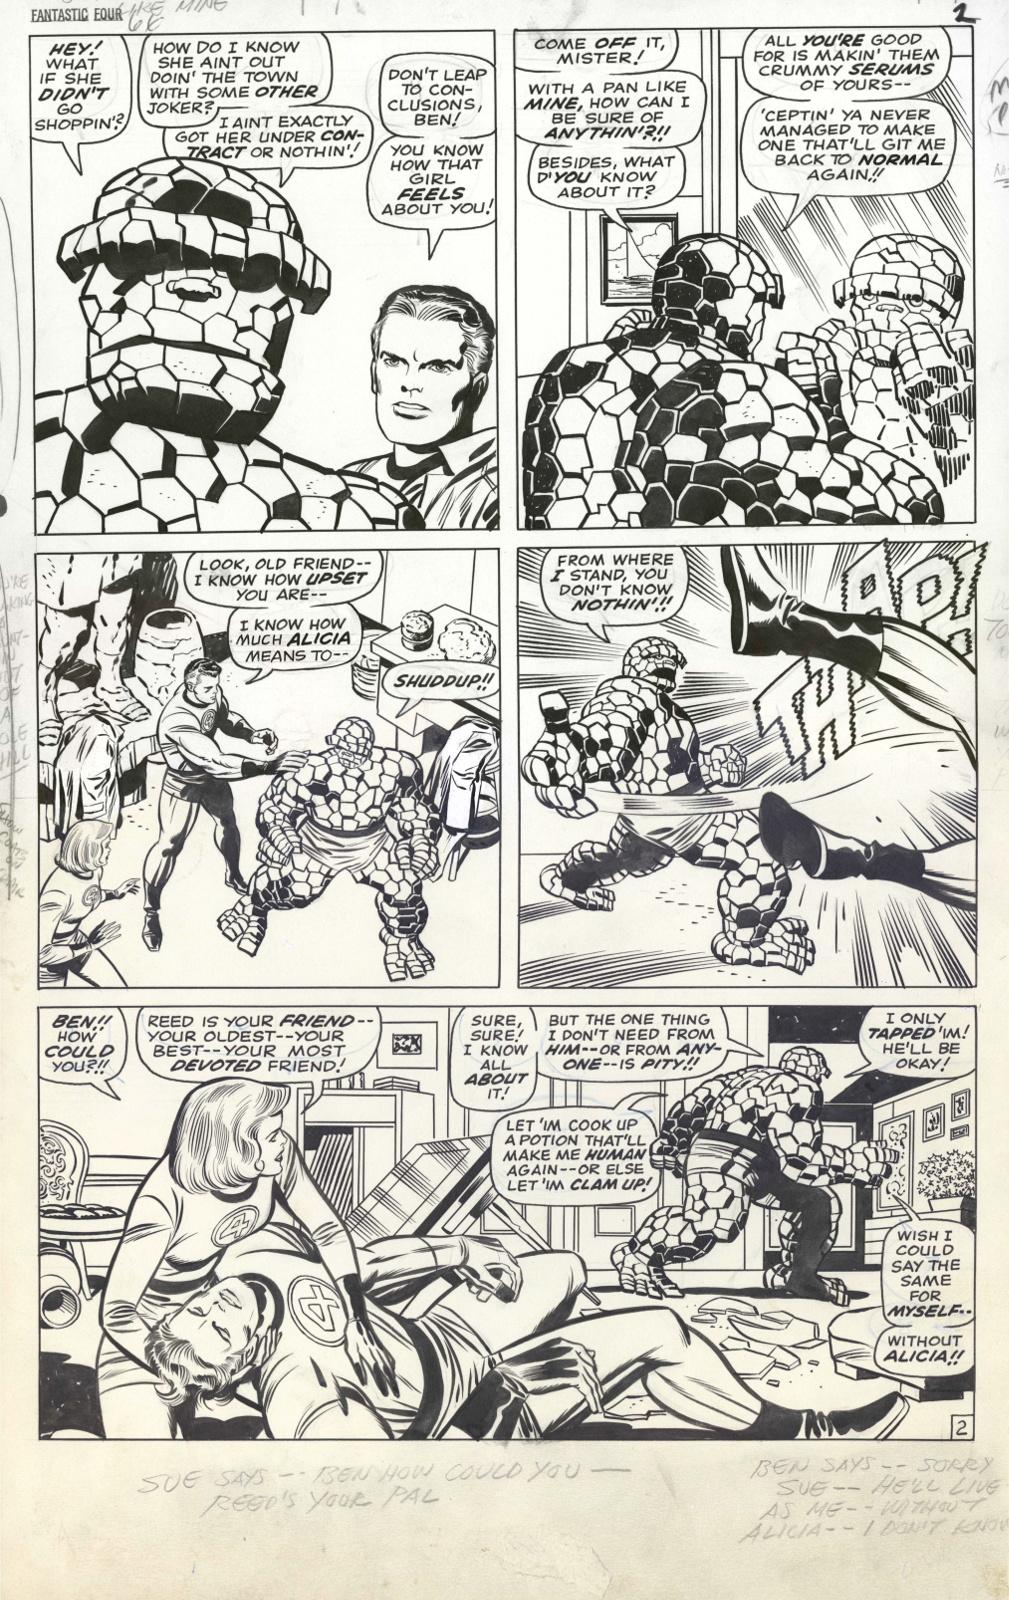 Fantastic Four 61-67